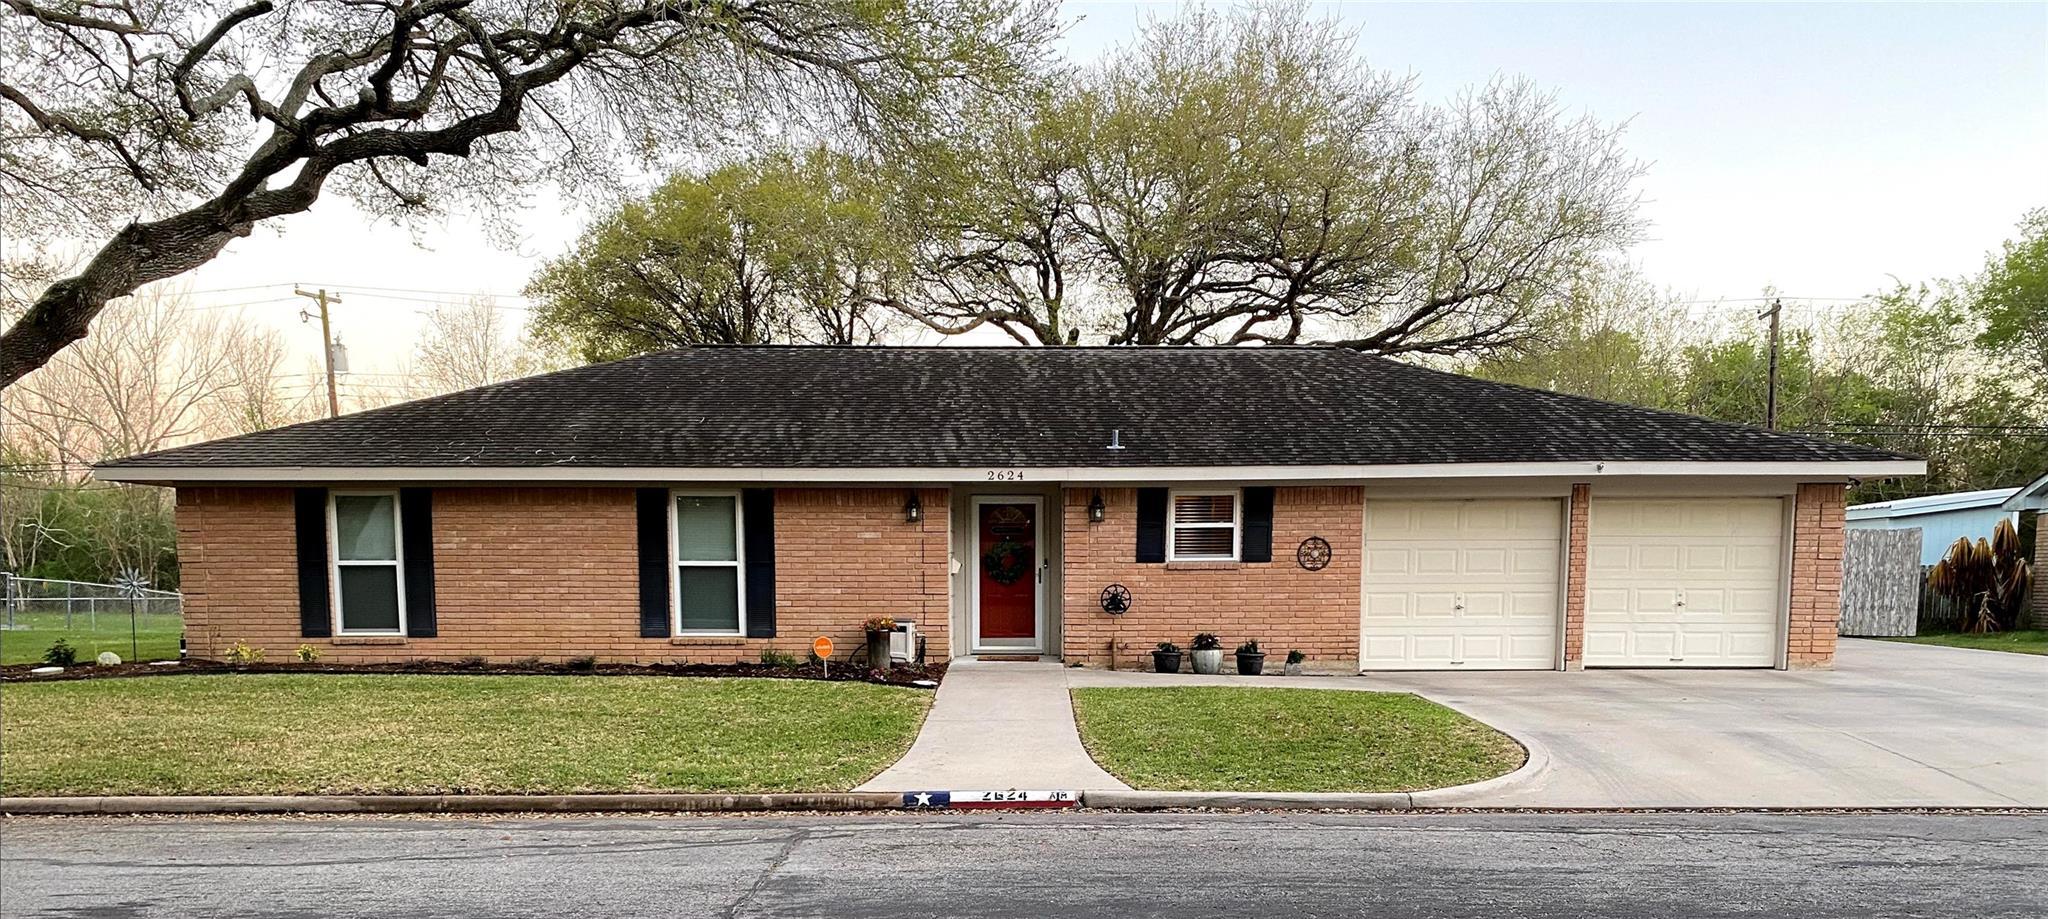 2624 Del Monte Ave Avenue Property Photo - Bay City, TX real estate listing